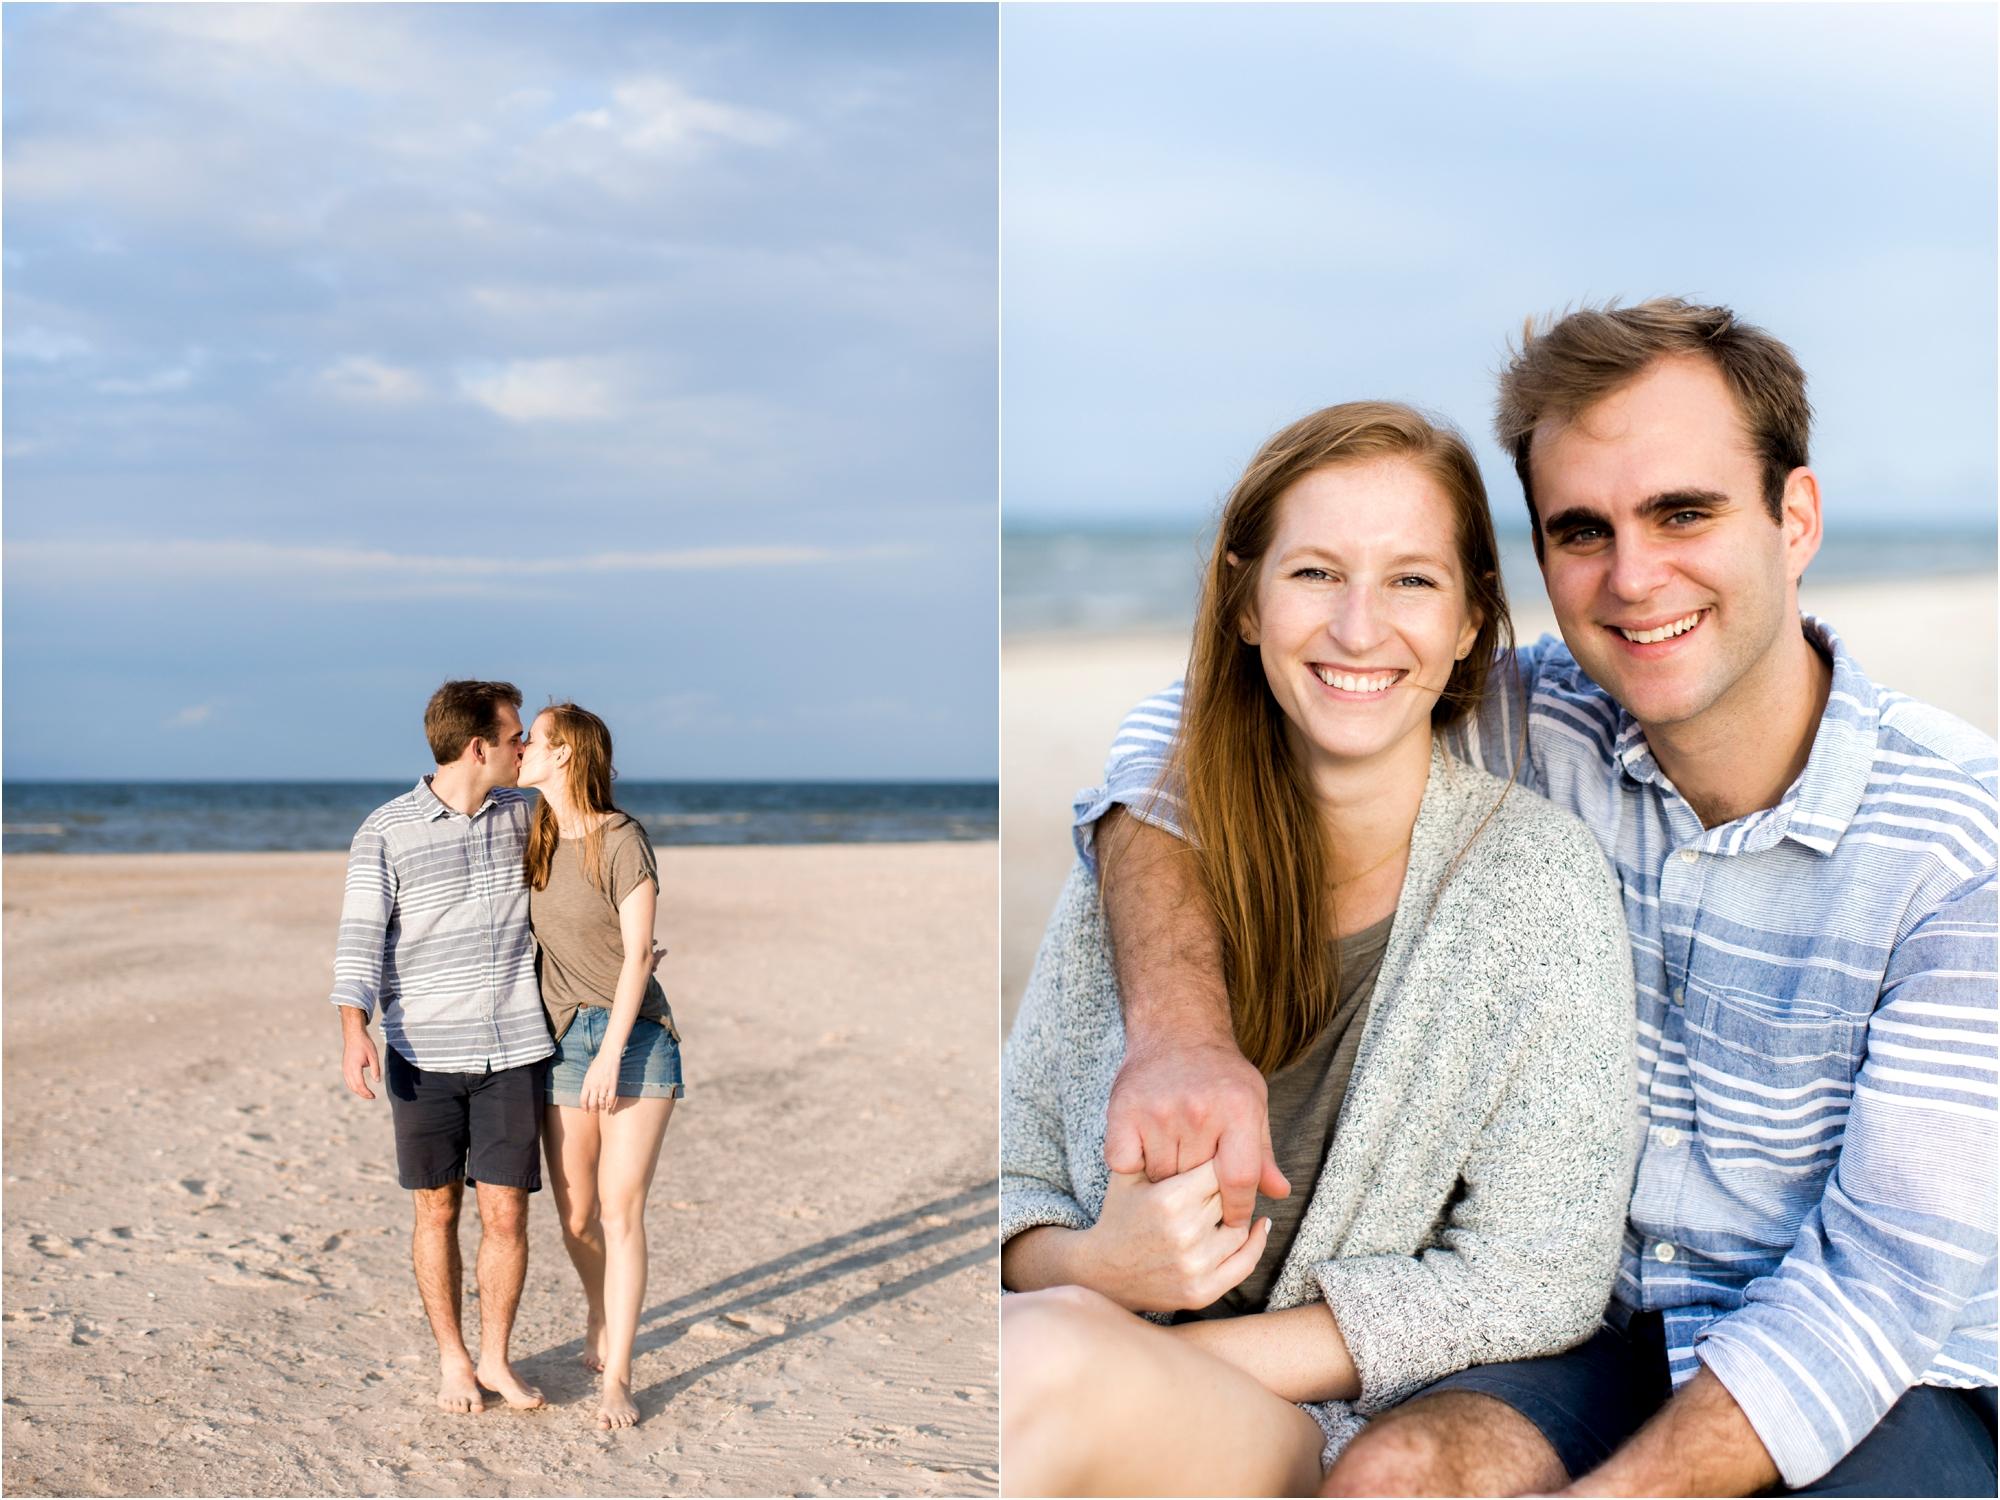 emily-drew-chesapeake-bay-beach-virginia-engagement-photos_0008.jpg